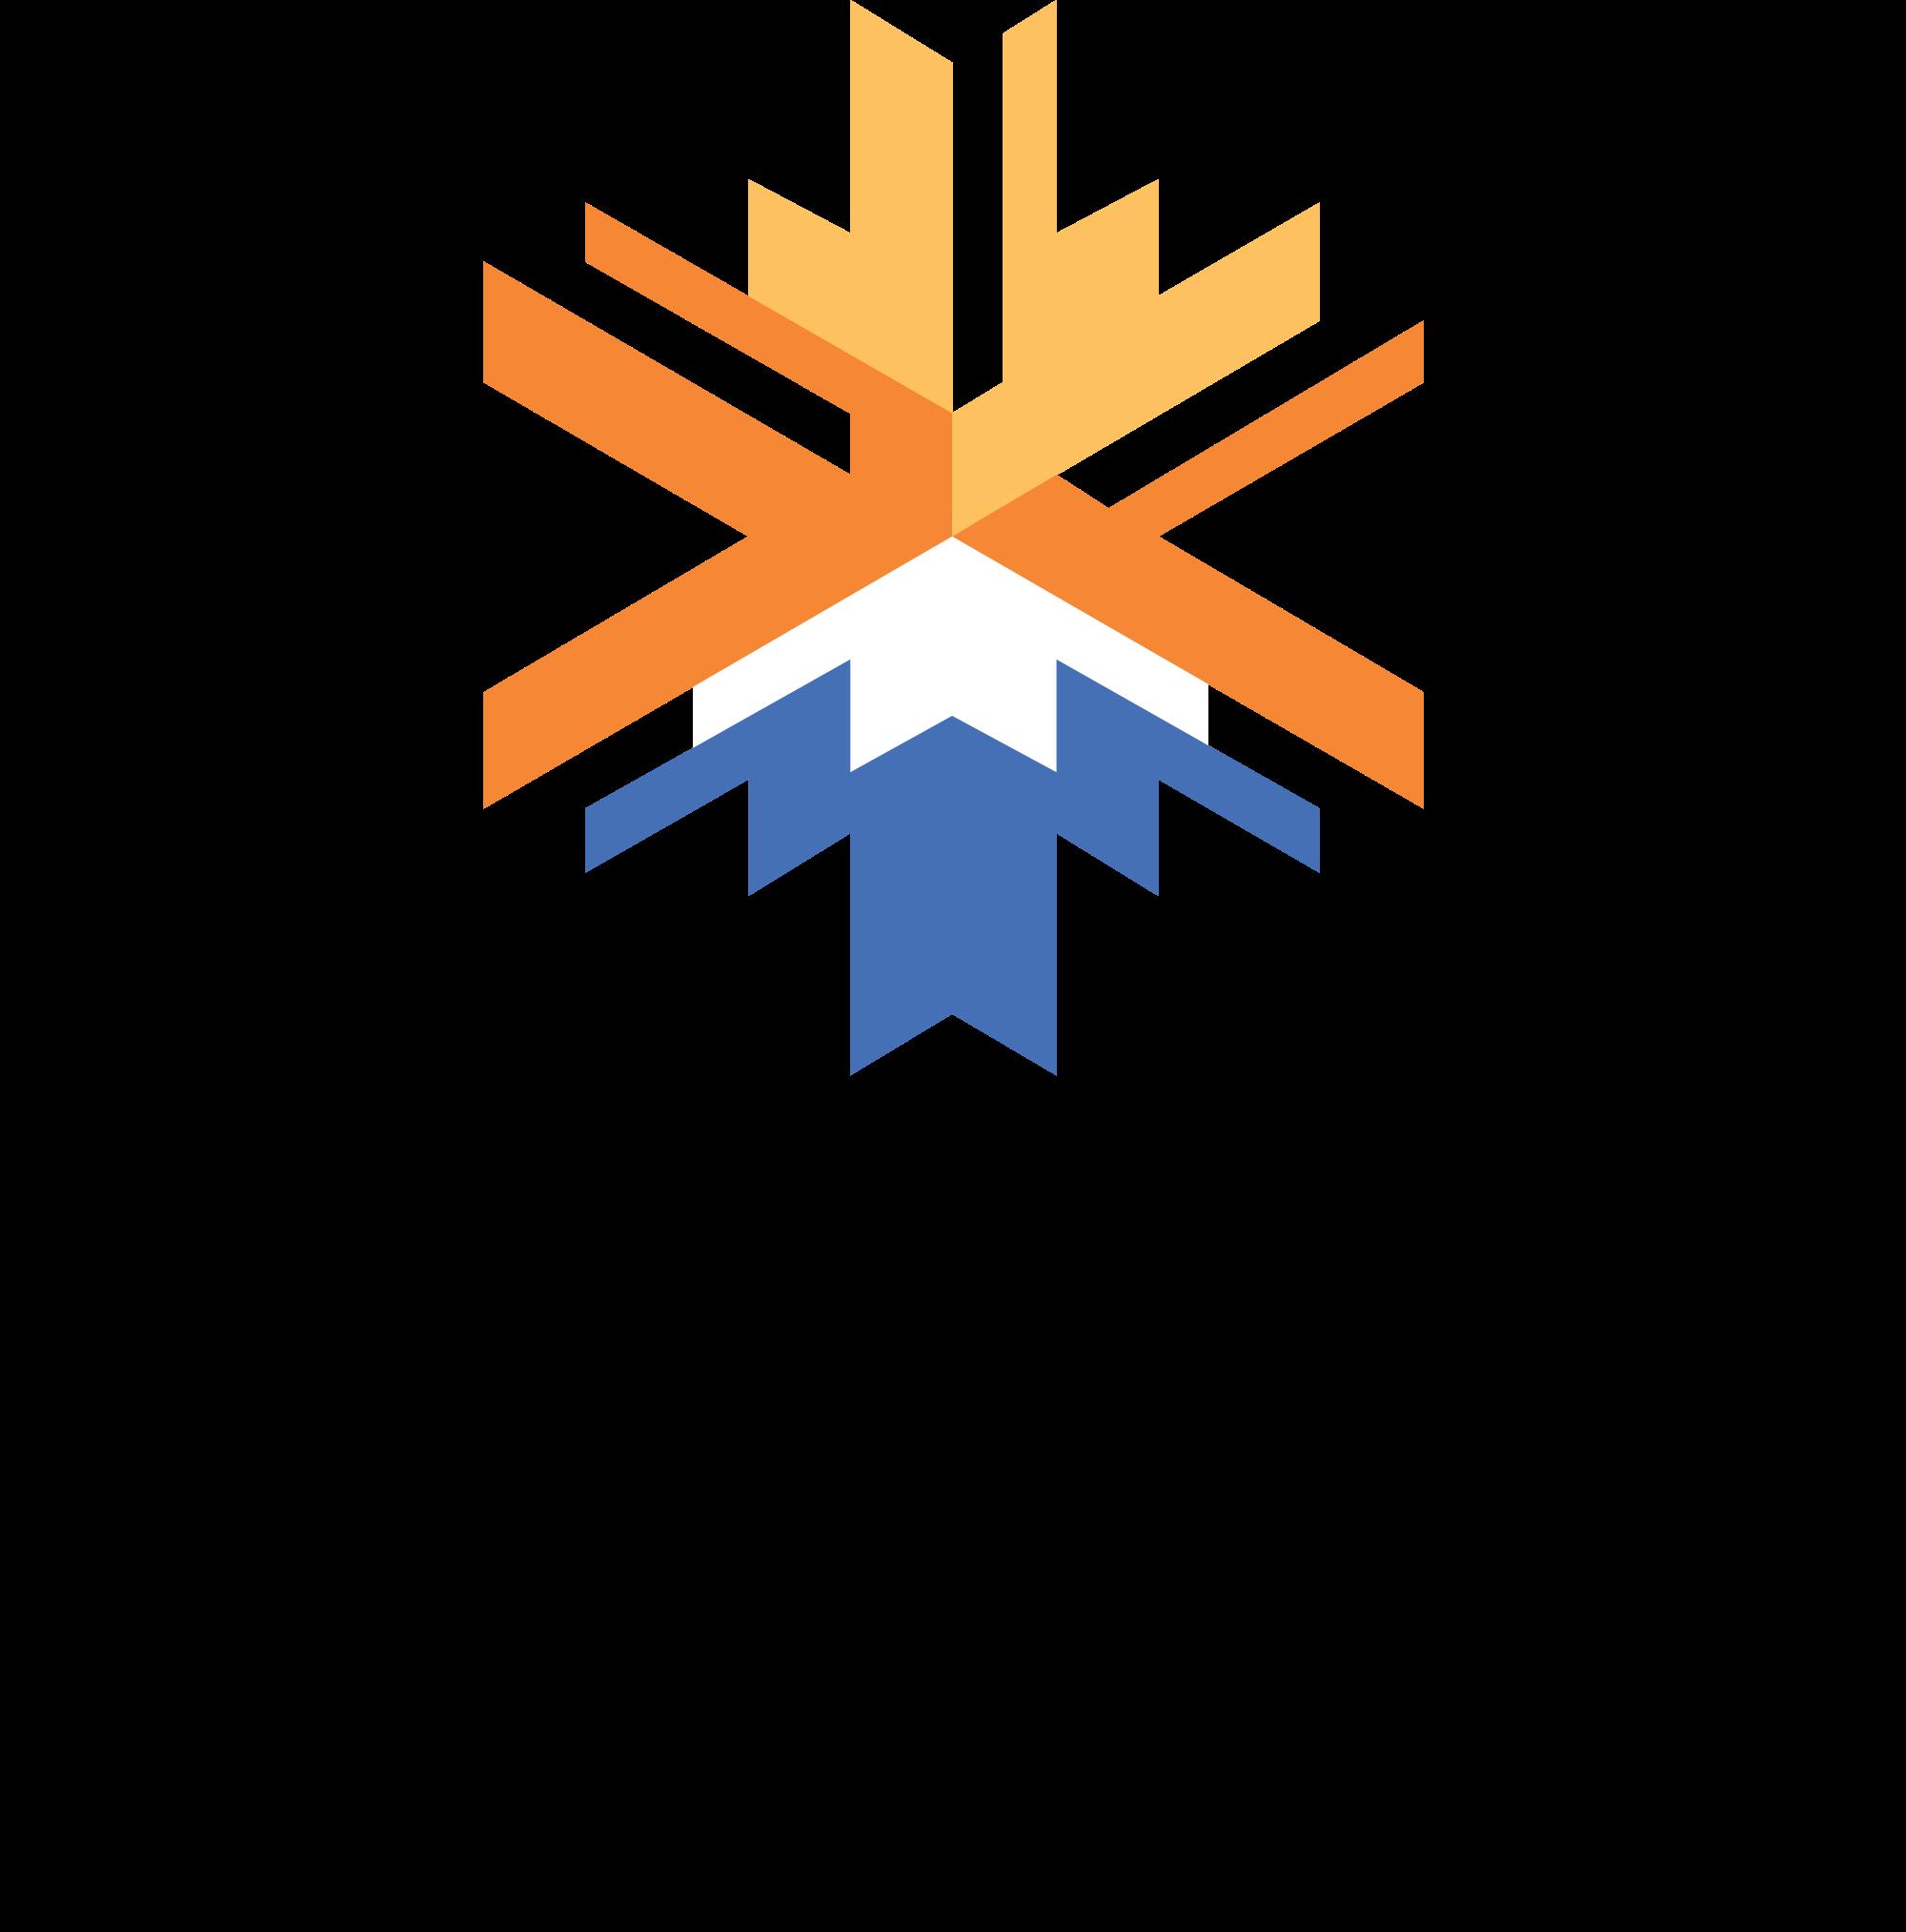 Salt Lake City 2002   Olympic games, Olympic logo, 2002 ...